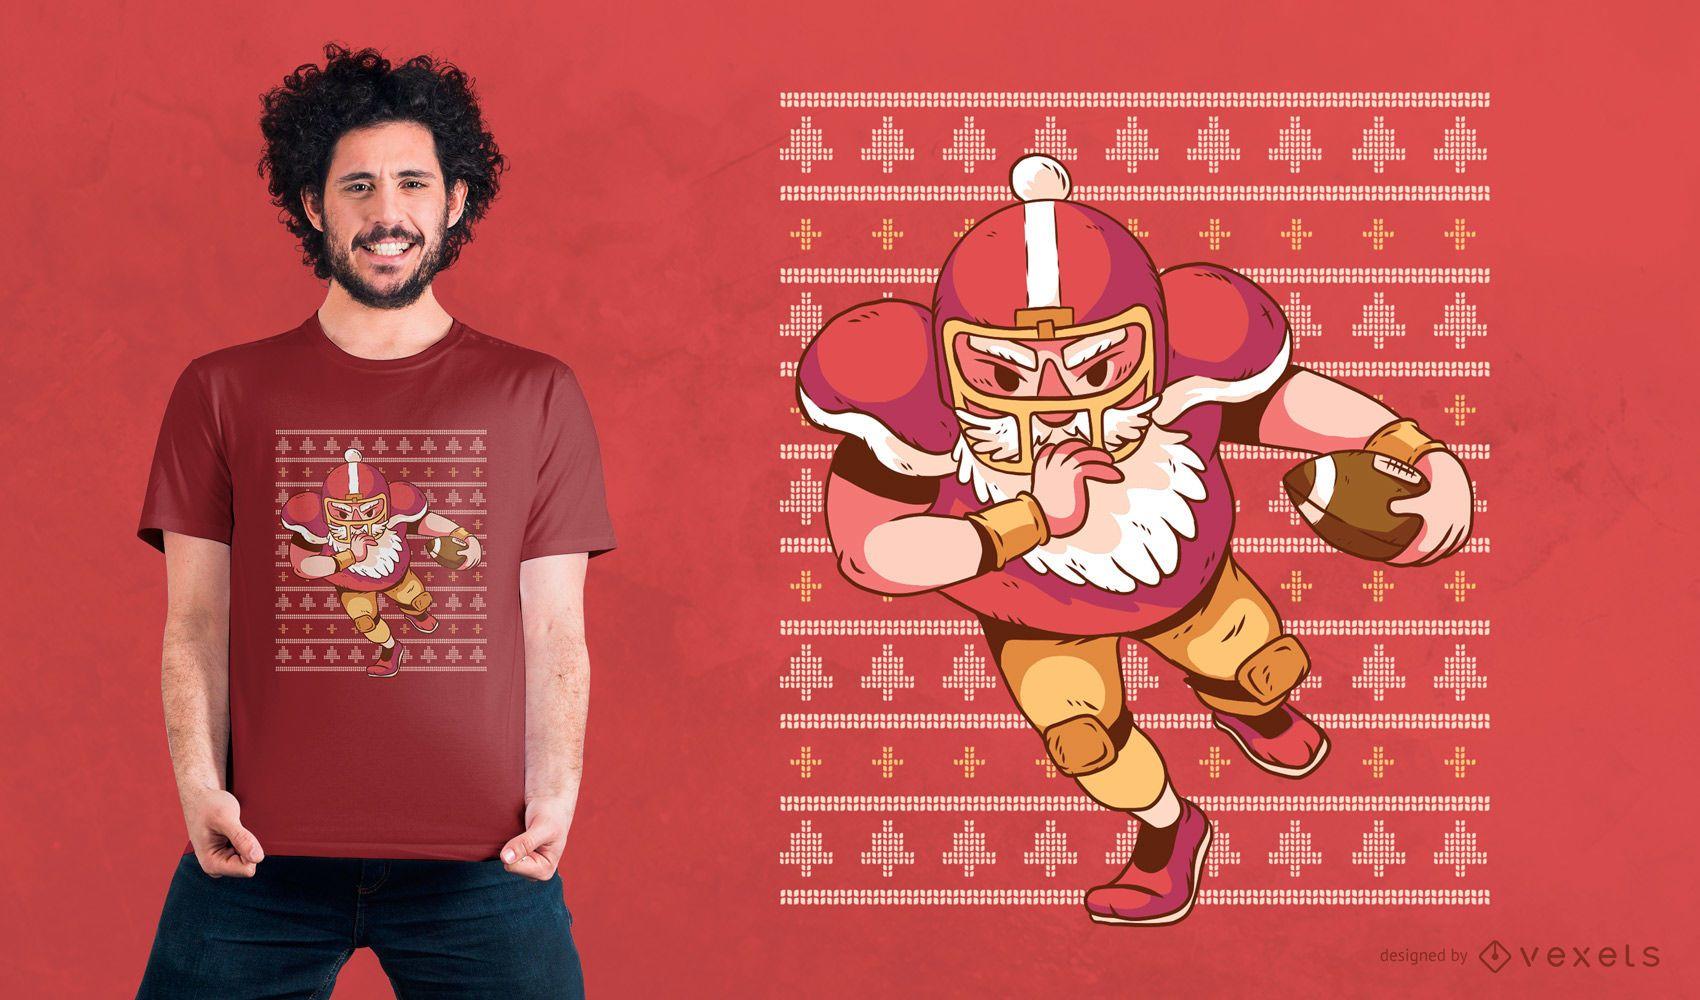 Dise?o de camiseta de Navidad de f?tbol de Santa